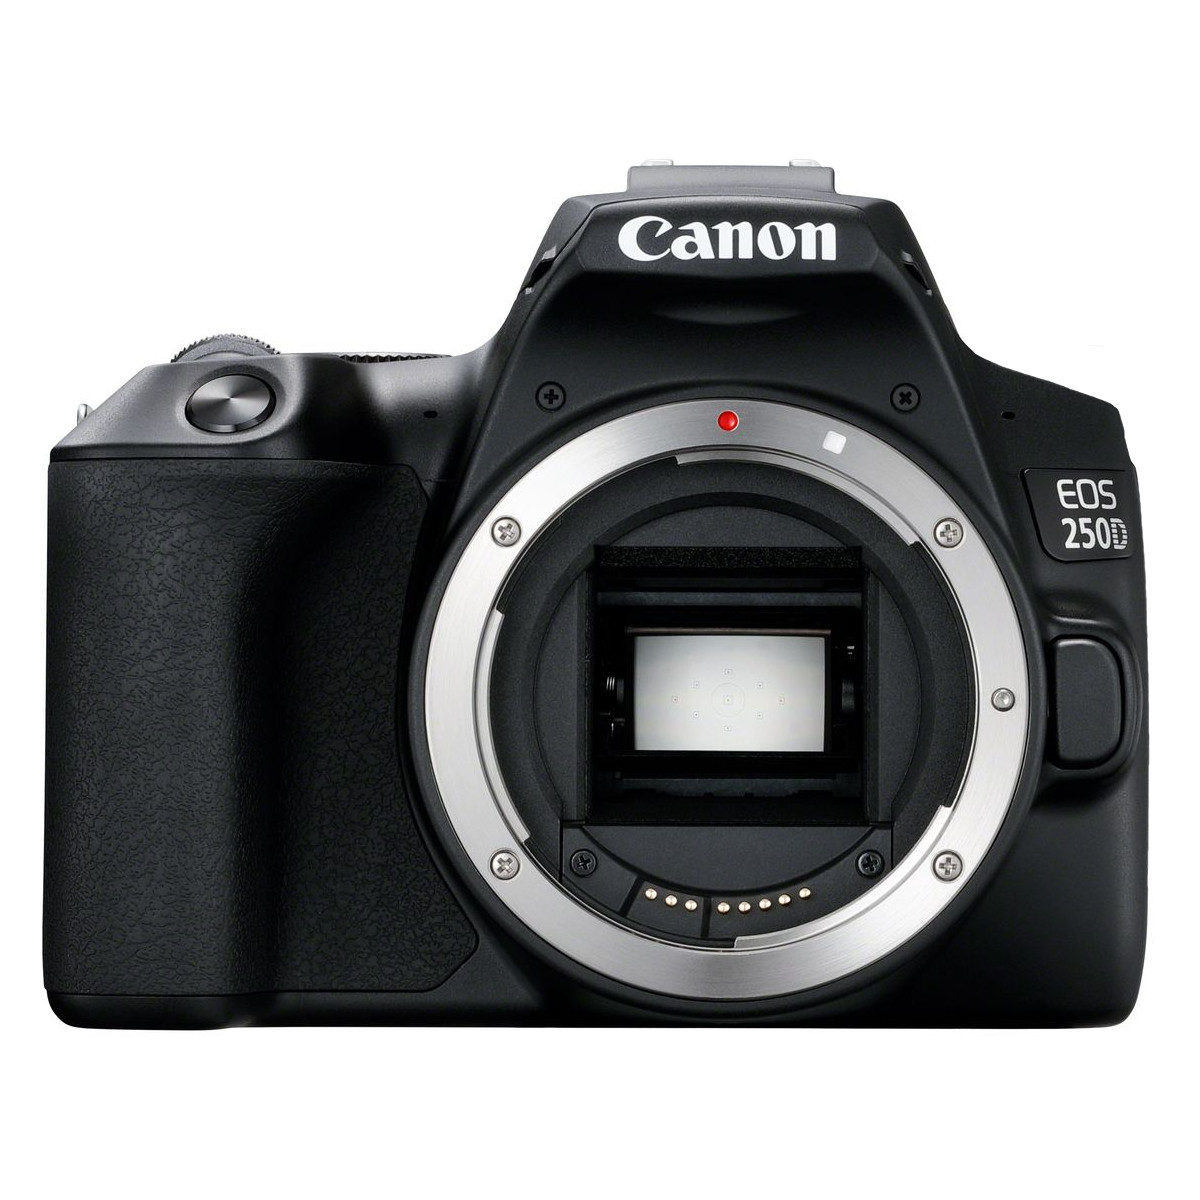 Canon EOS 250D DSLR open-box <br/>€ 389.00 <br/> <a href='https://www.cameranu.nl/fotografie/?tt=12190_474631_241358_&r=https%3A%2F%2Fwww.cameranu.nl%2Fnl%2Fp3160197%2Fcanon-eos-250d-dslr-open-box%3Fchannable%3De10841.MzE2MDE5Nw%26utm_campaign%3D%26utm_content%3DEOS%2Bspiegelreflex%26utm_source%3DTradetracker%26utm_medium%3Dcpc%26utm_term%3DDigitale%2Bcamera%26apos%3Bs' target='_blank'>naar de winkel</a>